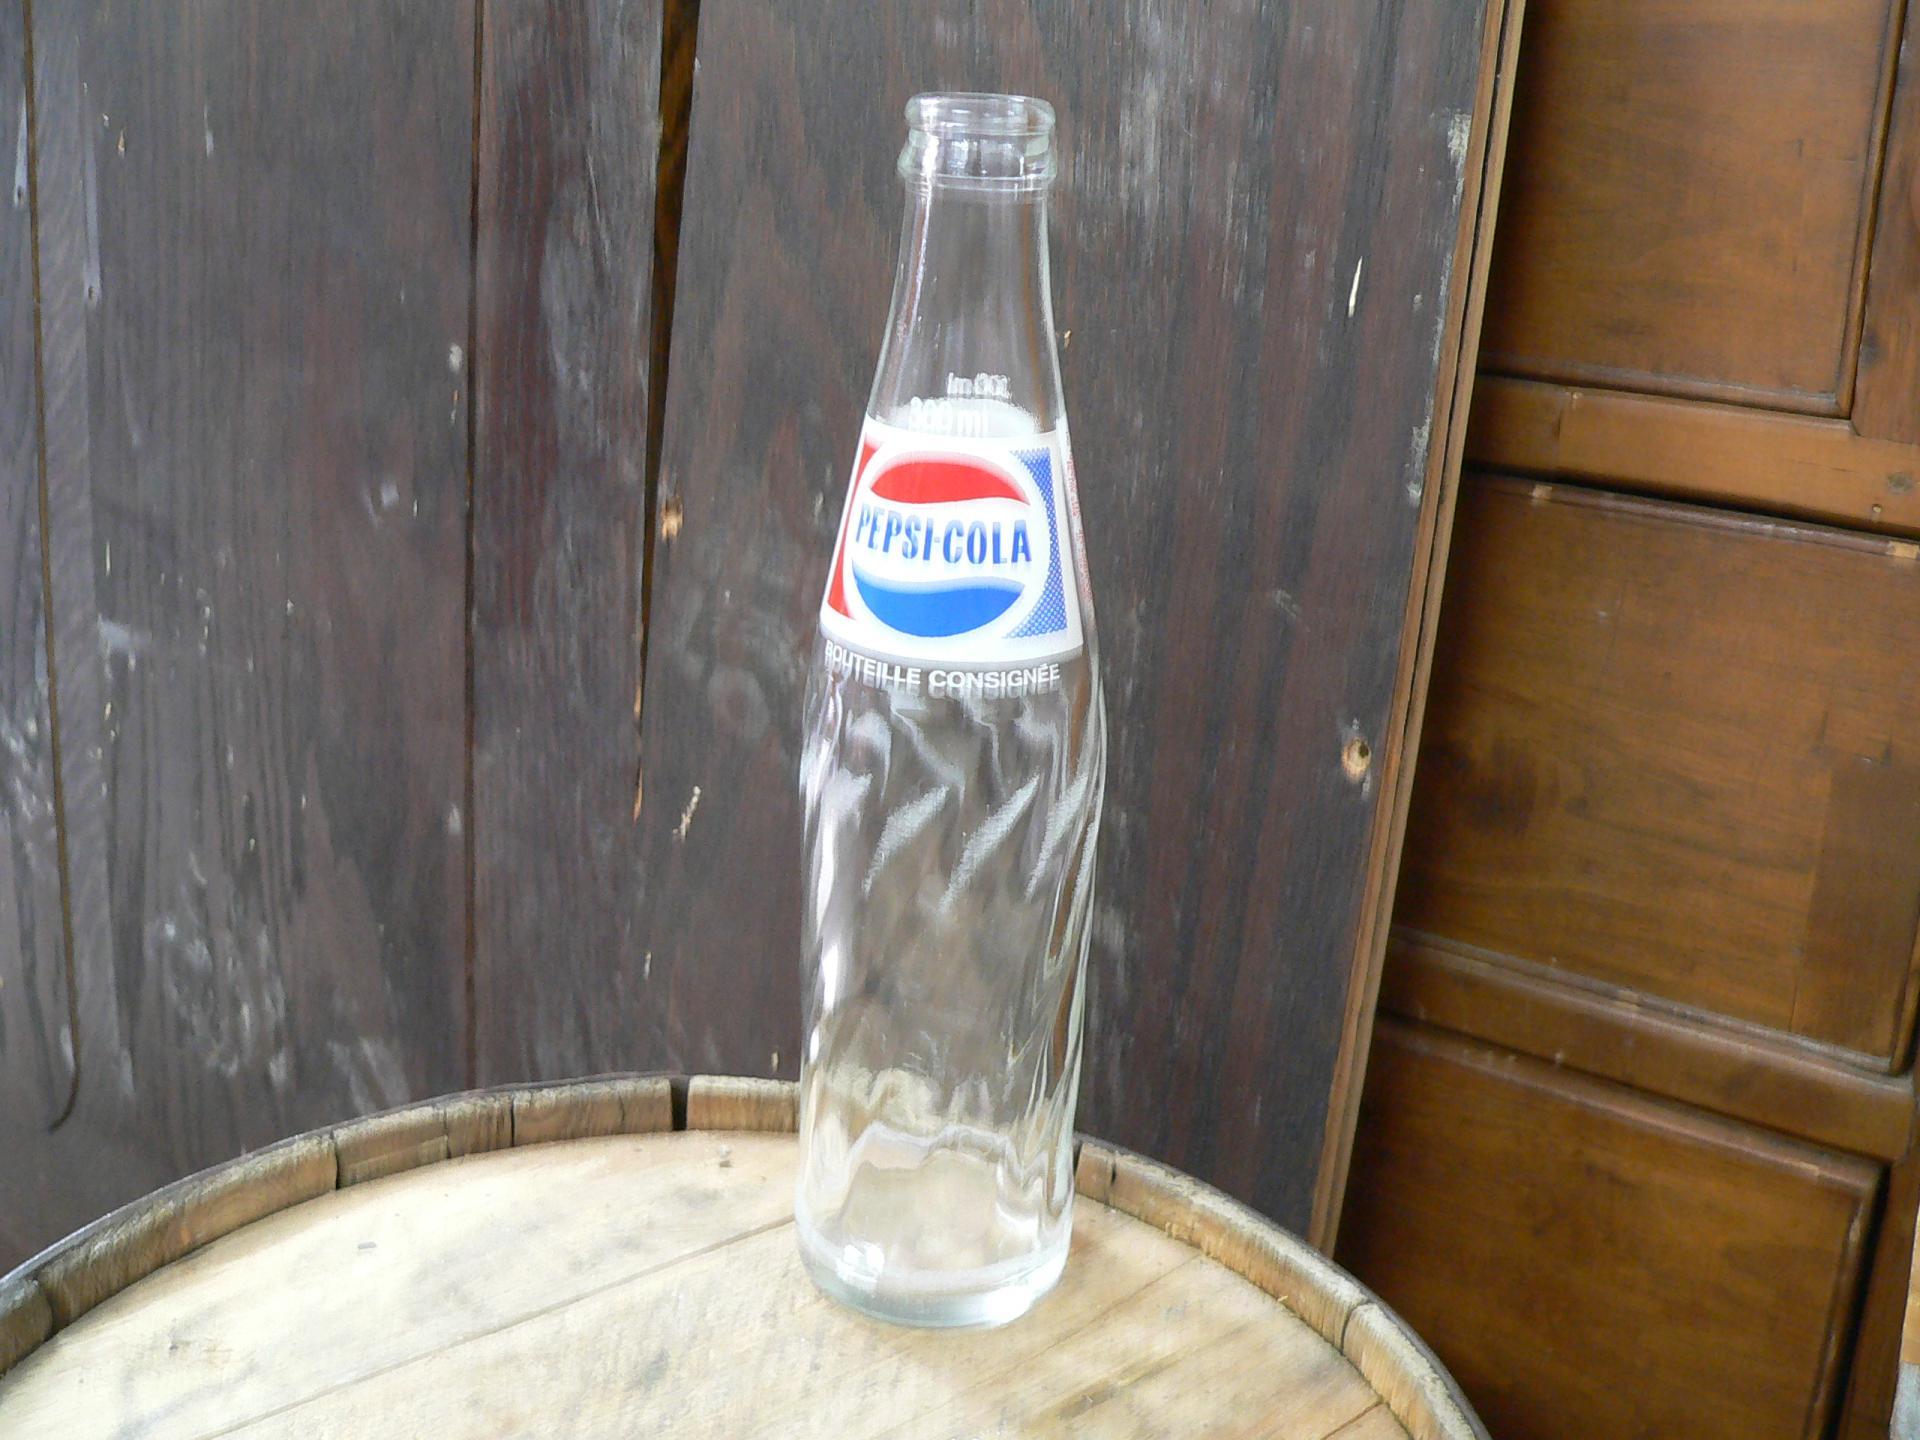 Bouteille pepsi cola # 4995.13